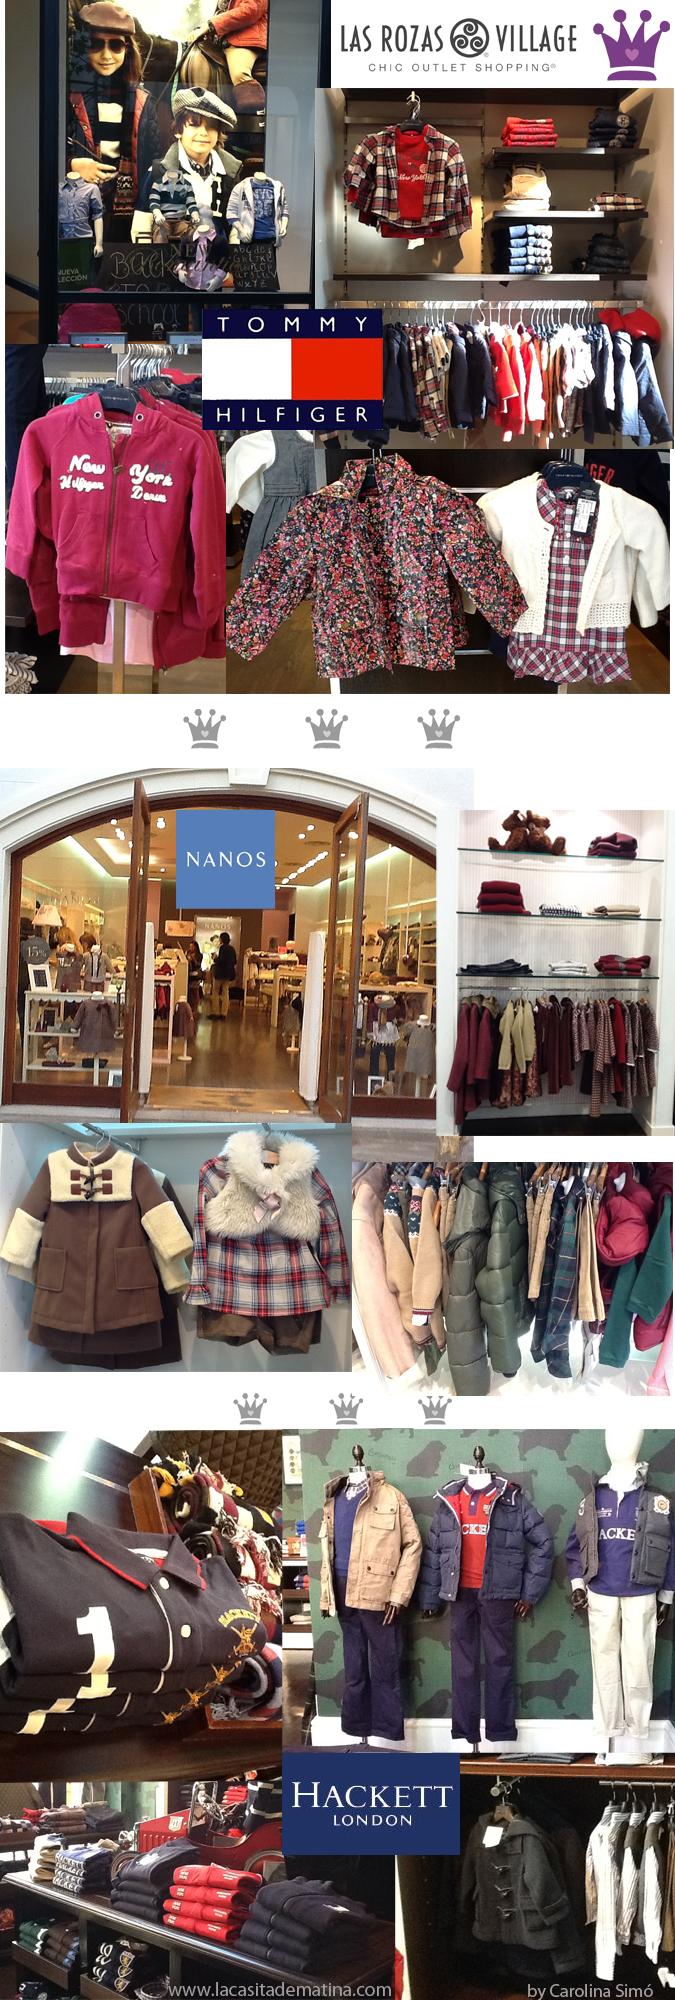 Las Rozas Village, Carolina Simó, Personal Shopper para niños. Blog de Moda Infantil, Nanos, Hackett, Tommy